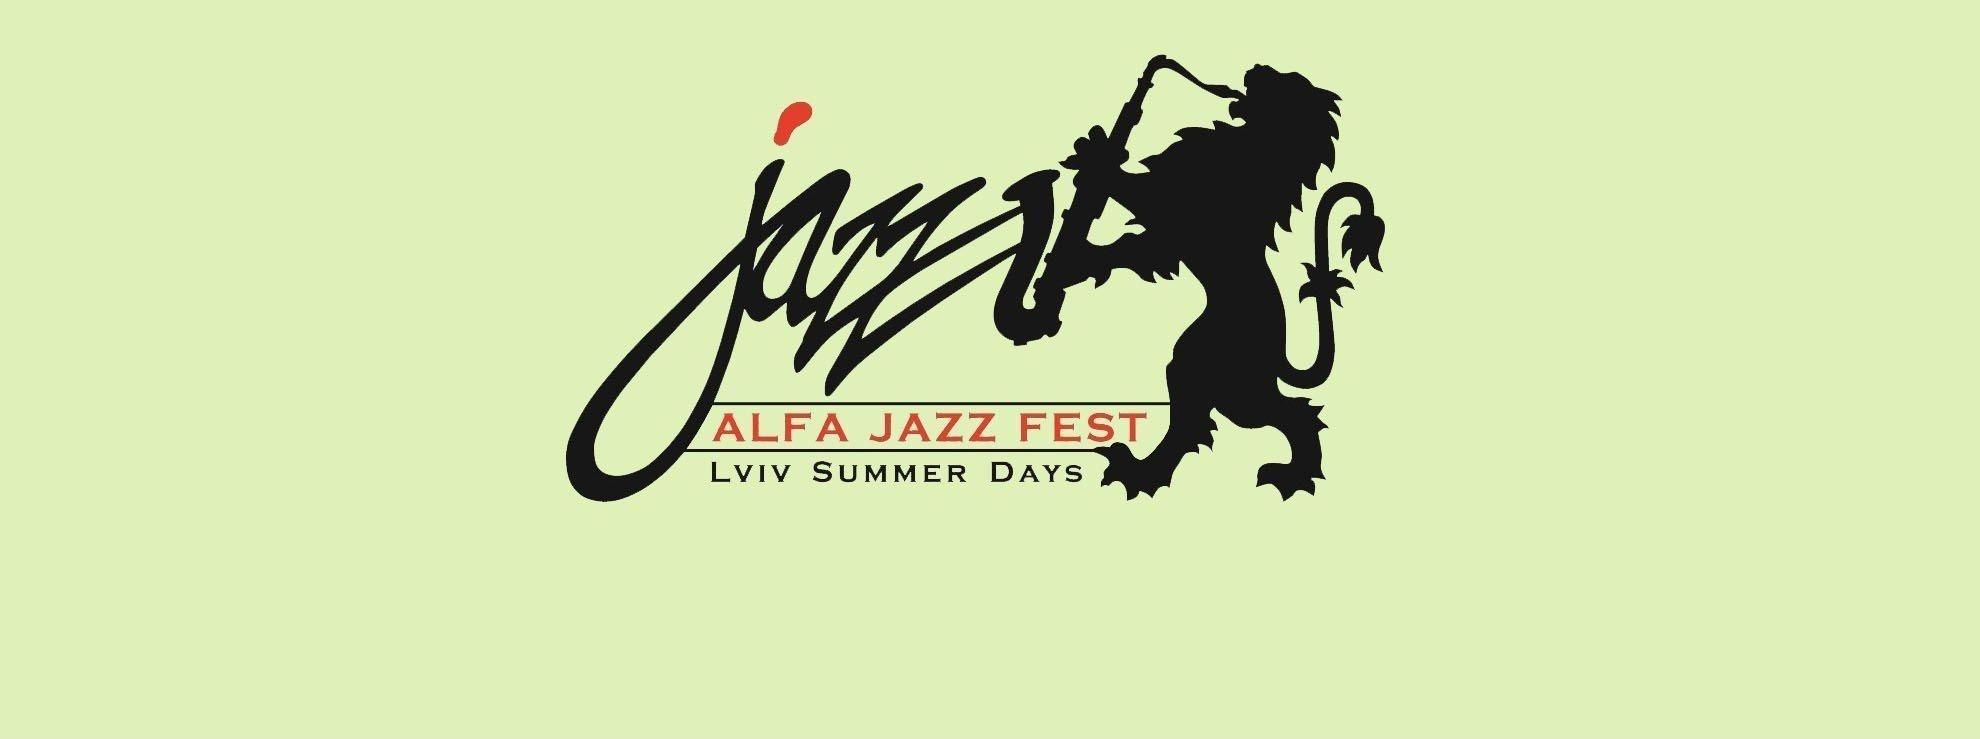 событие Leopolis Jazz Fest (Леополис Джаз Фест)